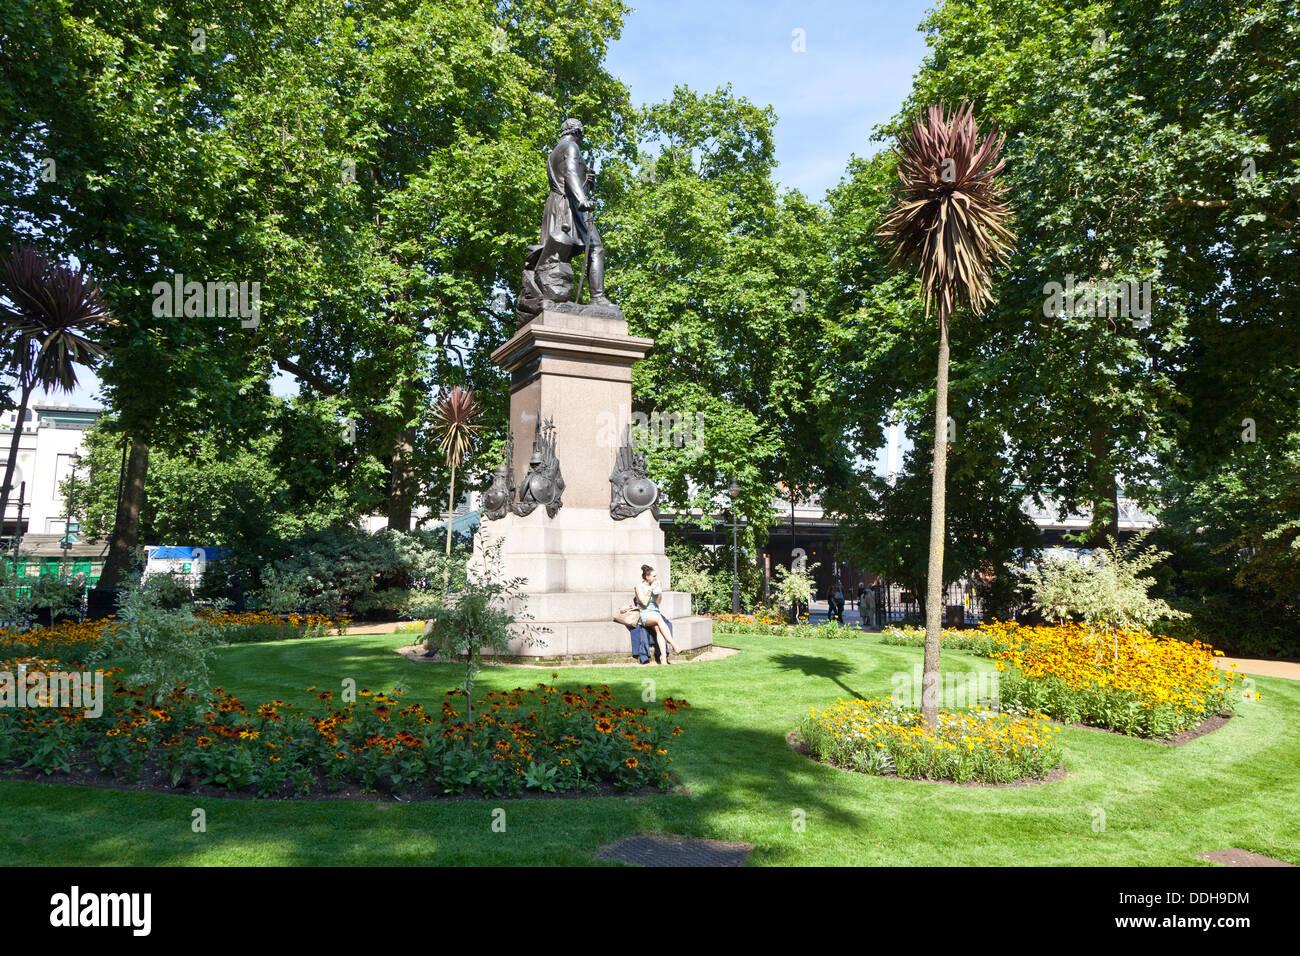 Victoria Embankment Gardens London Uk Stock Photo 60002256 Alamy